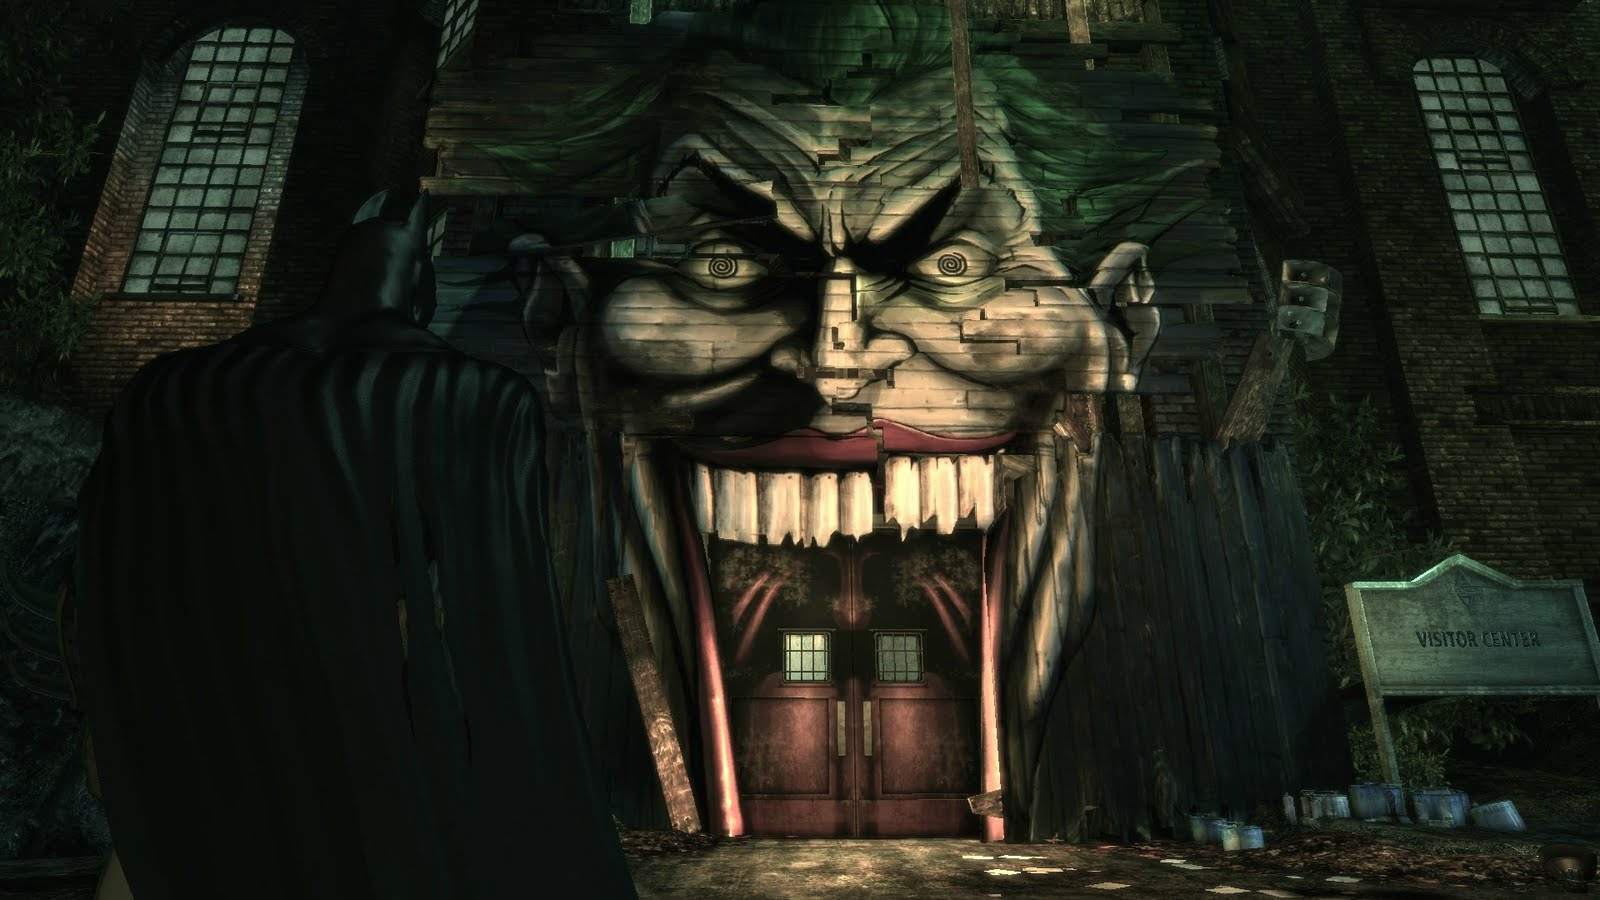 joker 3d wallpaper - wallpapersafari